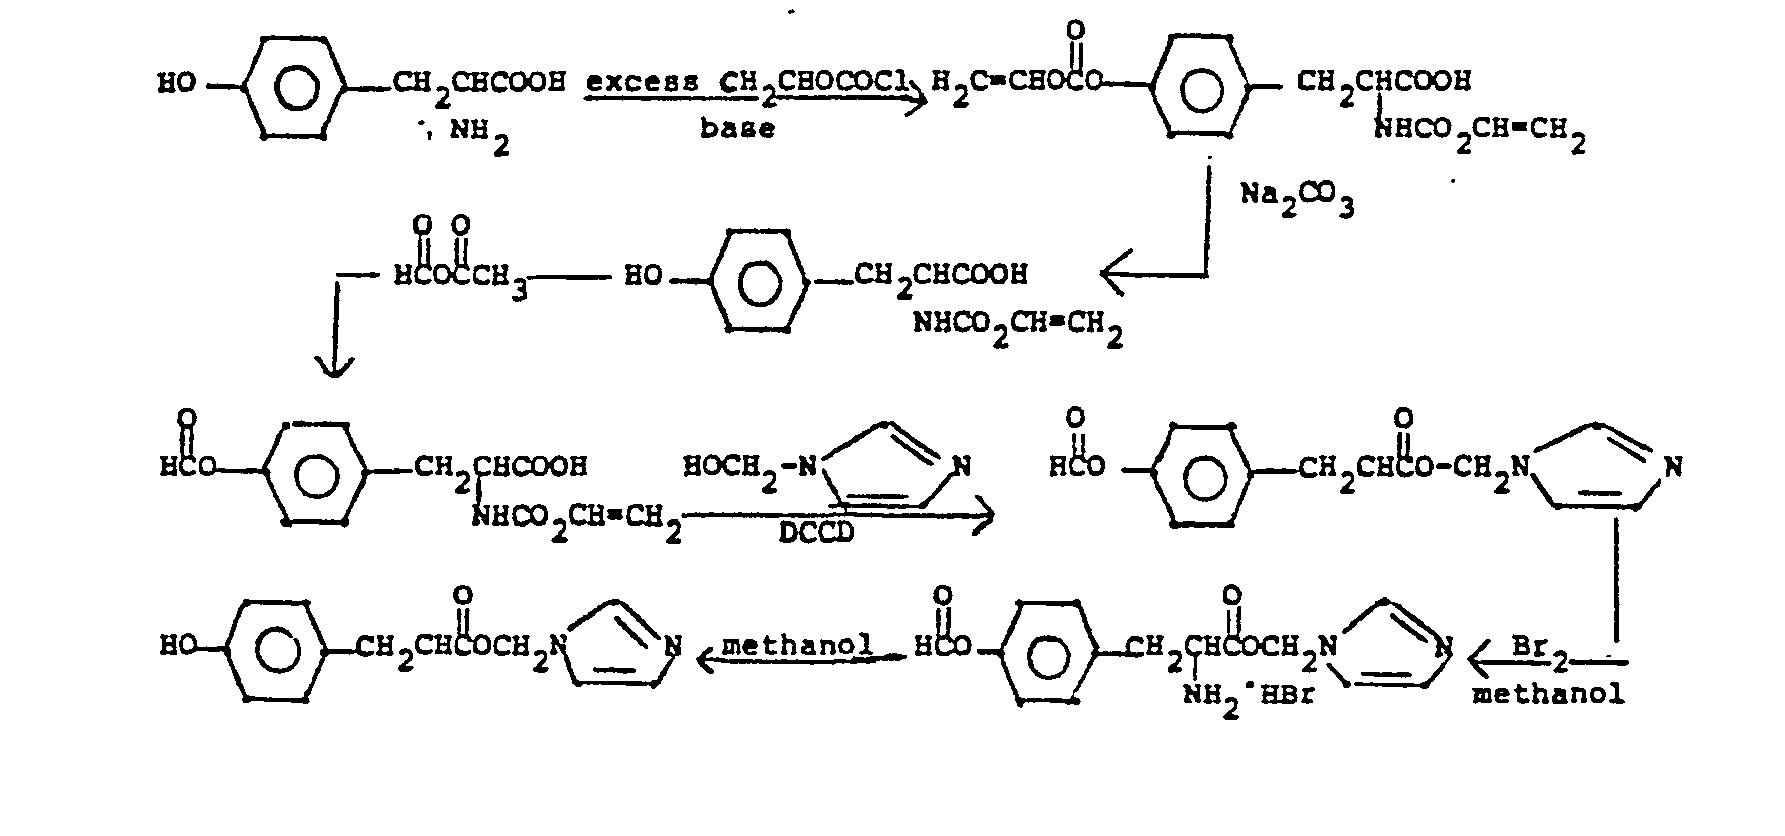 17-hydroxysteroids